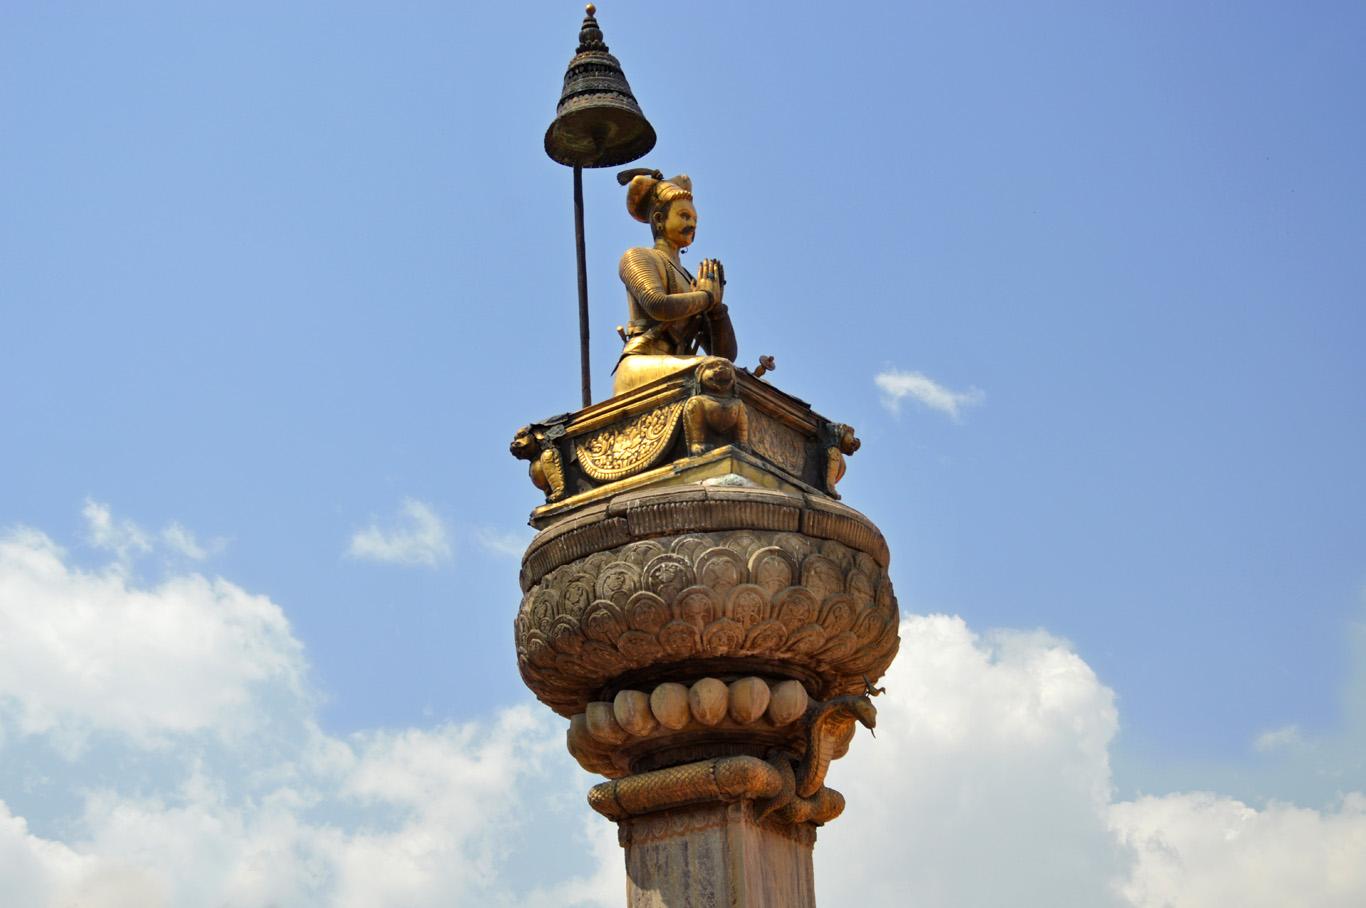 A statue of a Hundu God, Bhaktapur Durbar Square